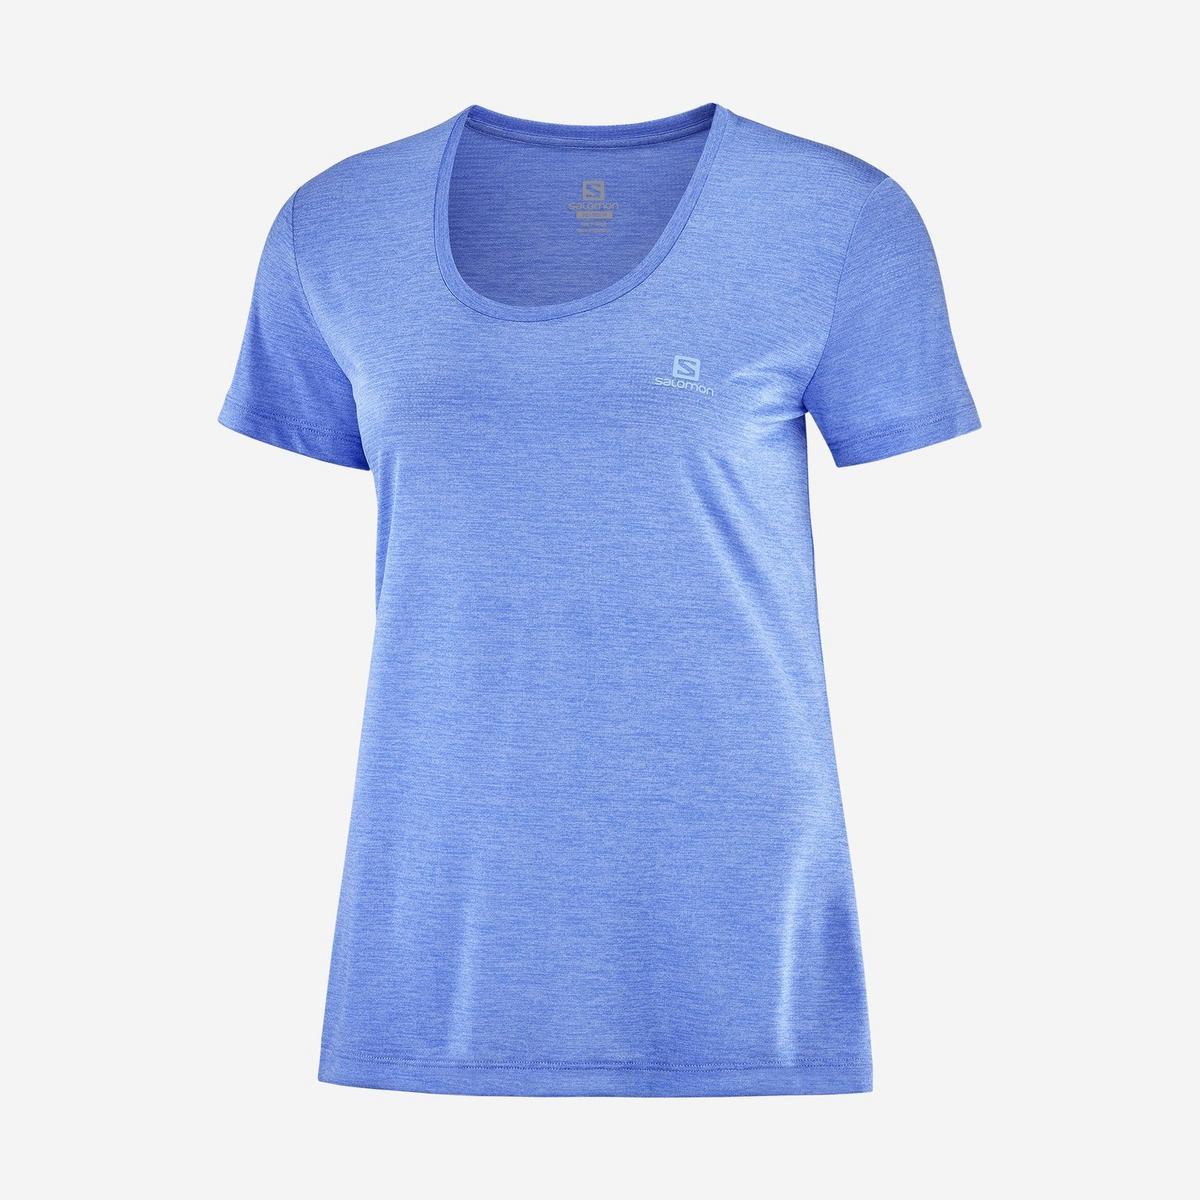 Salomon Women's Agile SS Tee - Blue